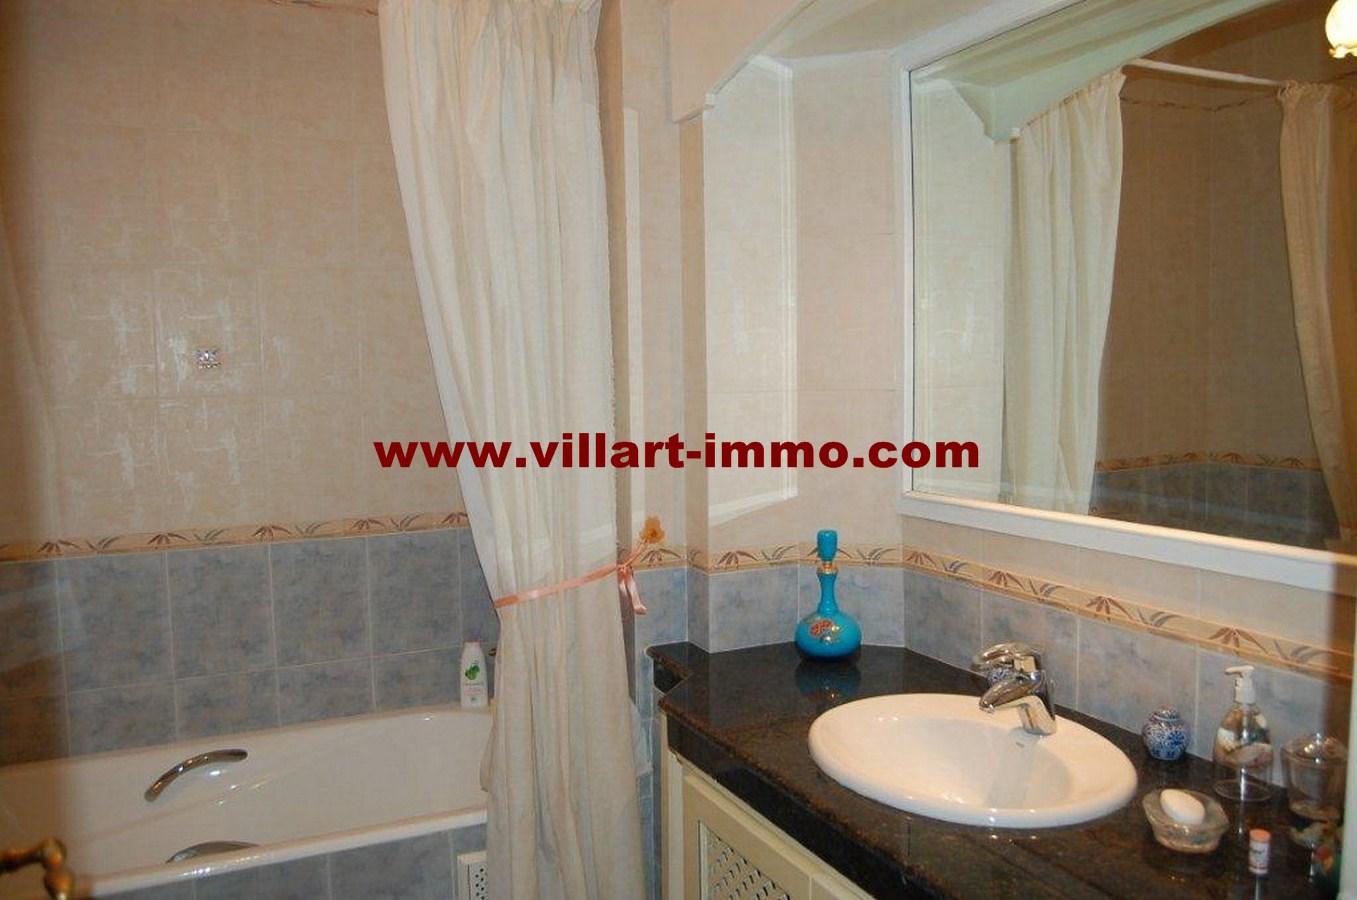 11-vente-appartement-tanger-la-montagne-salle-de-bain-1-va452-villart-immo